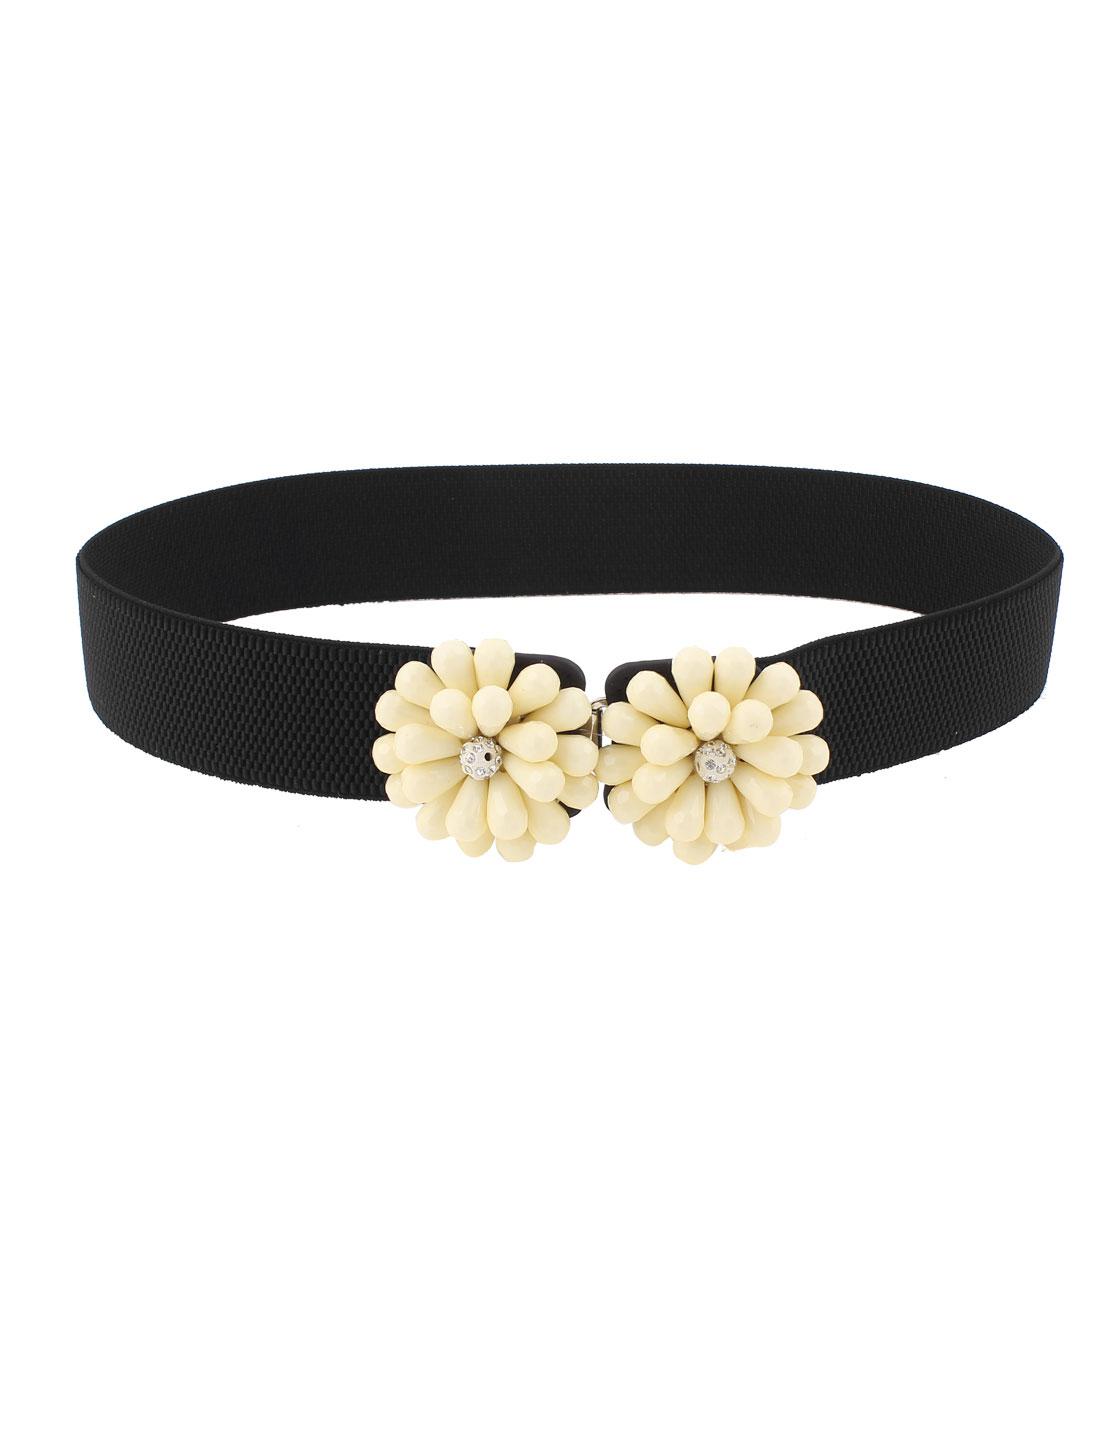 Flower Shape Interlocking Buckle Elastic Waist Belt Black for Women